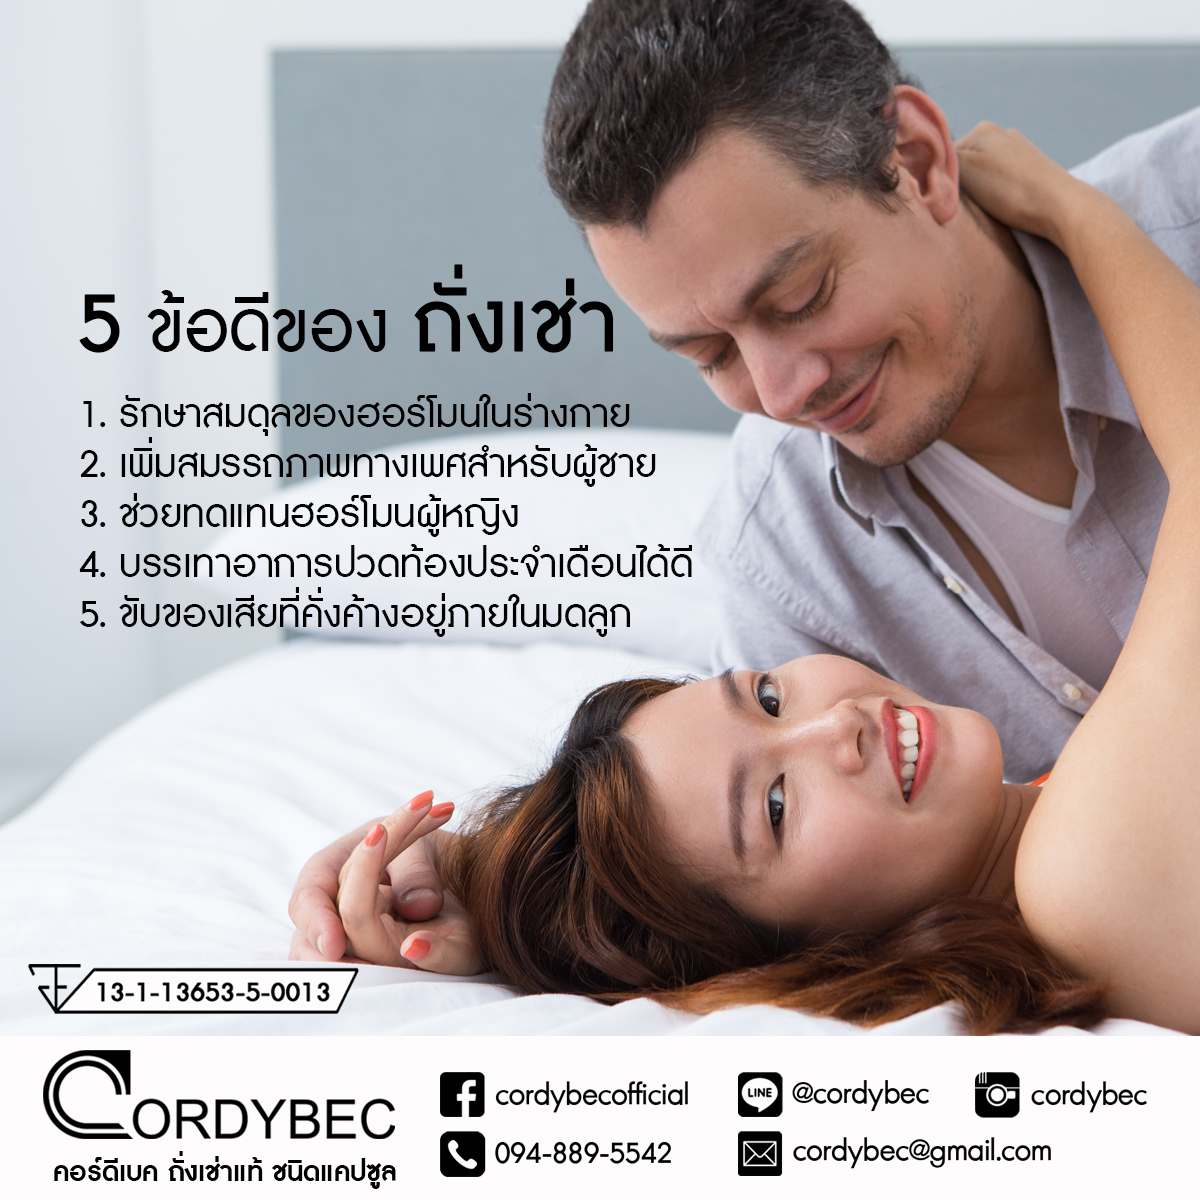 Cordybec Sex 002